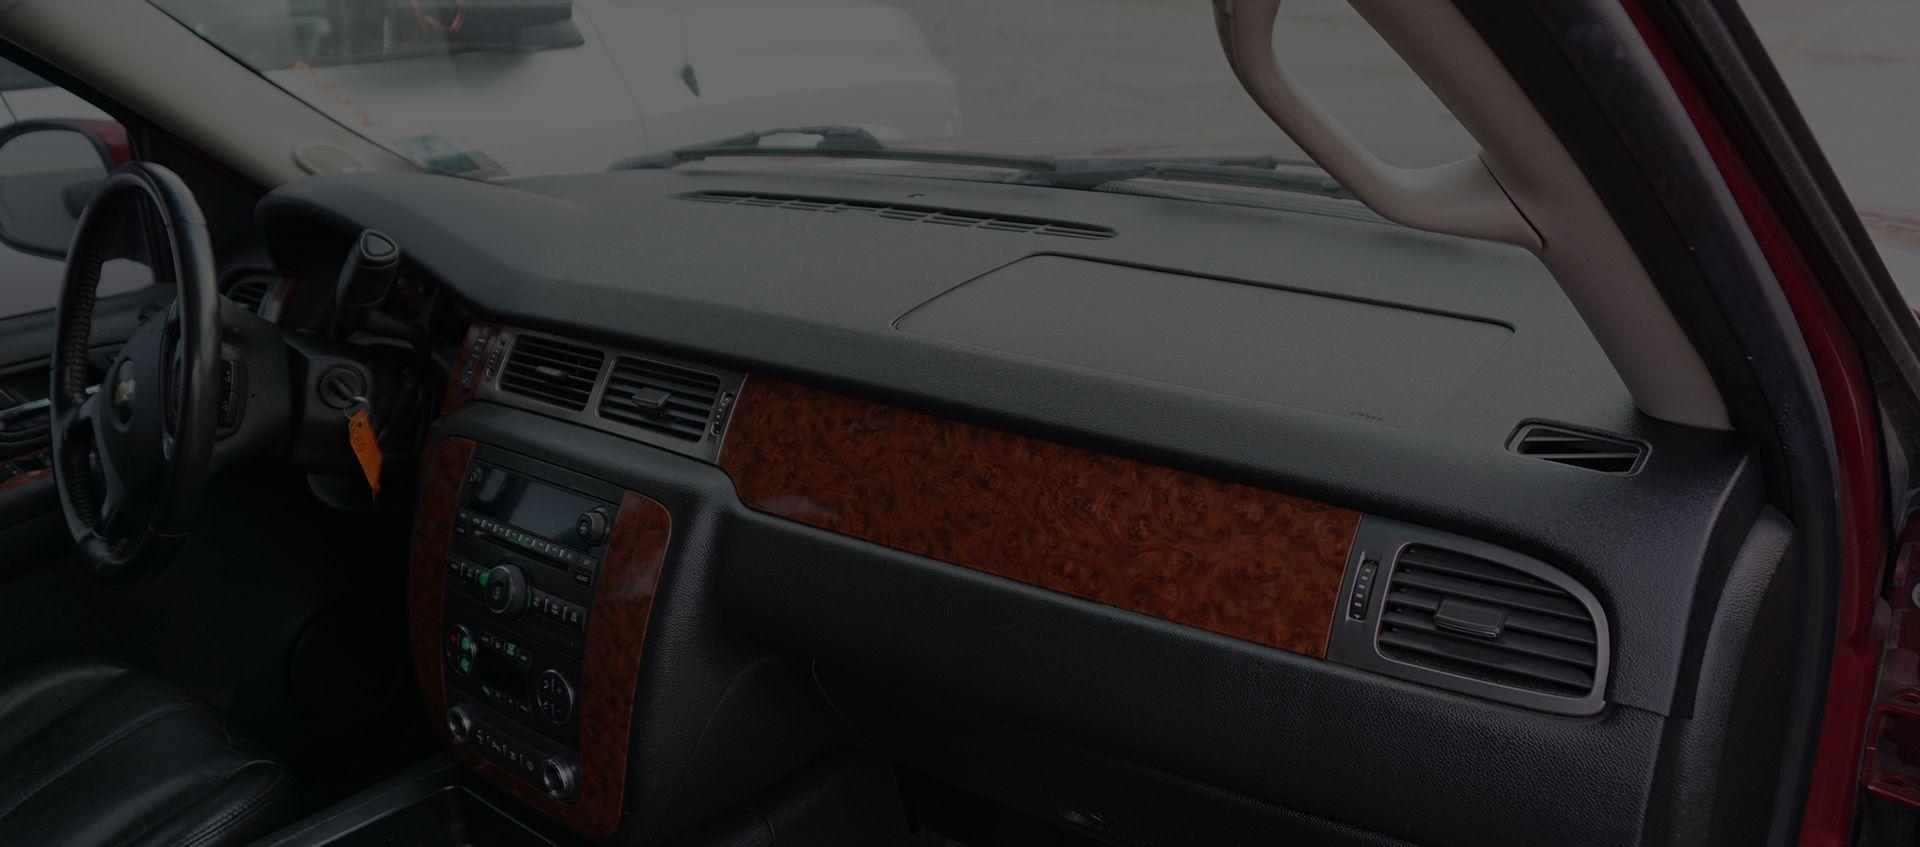 hight resolution of 2002 dodge ram 1500 cracked dash